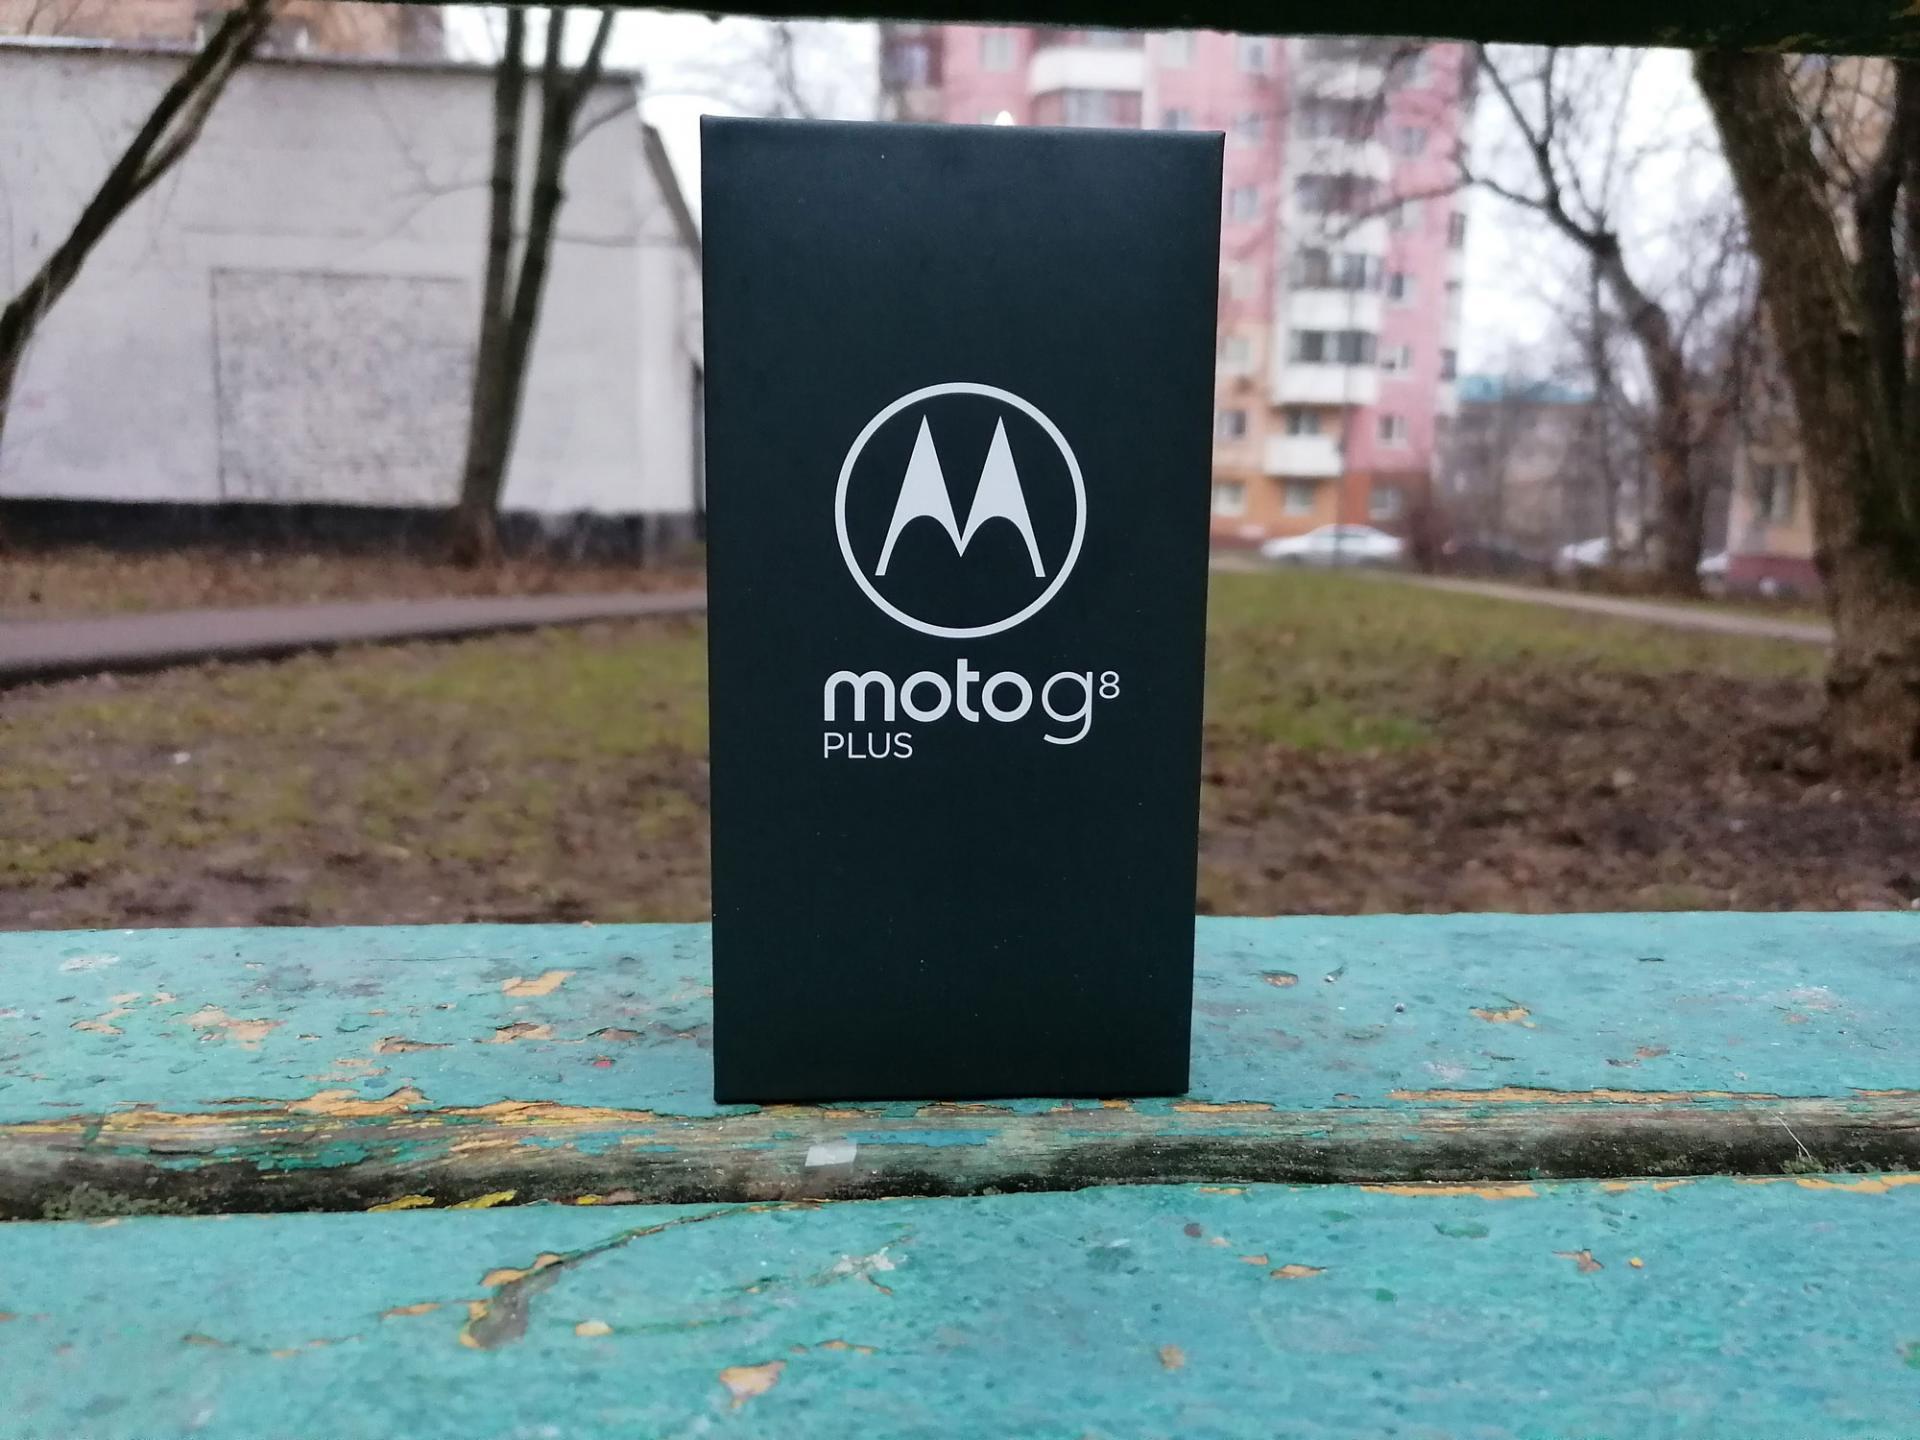 Обзор смартфона Motorola Moto G8 Plus